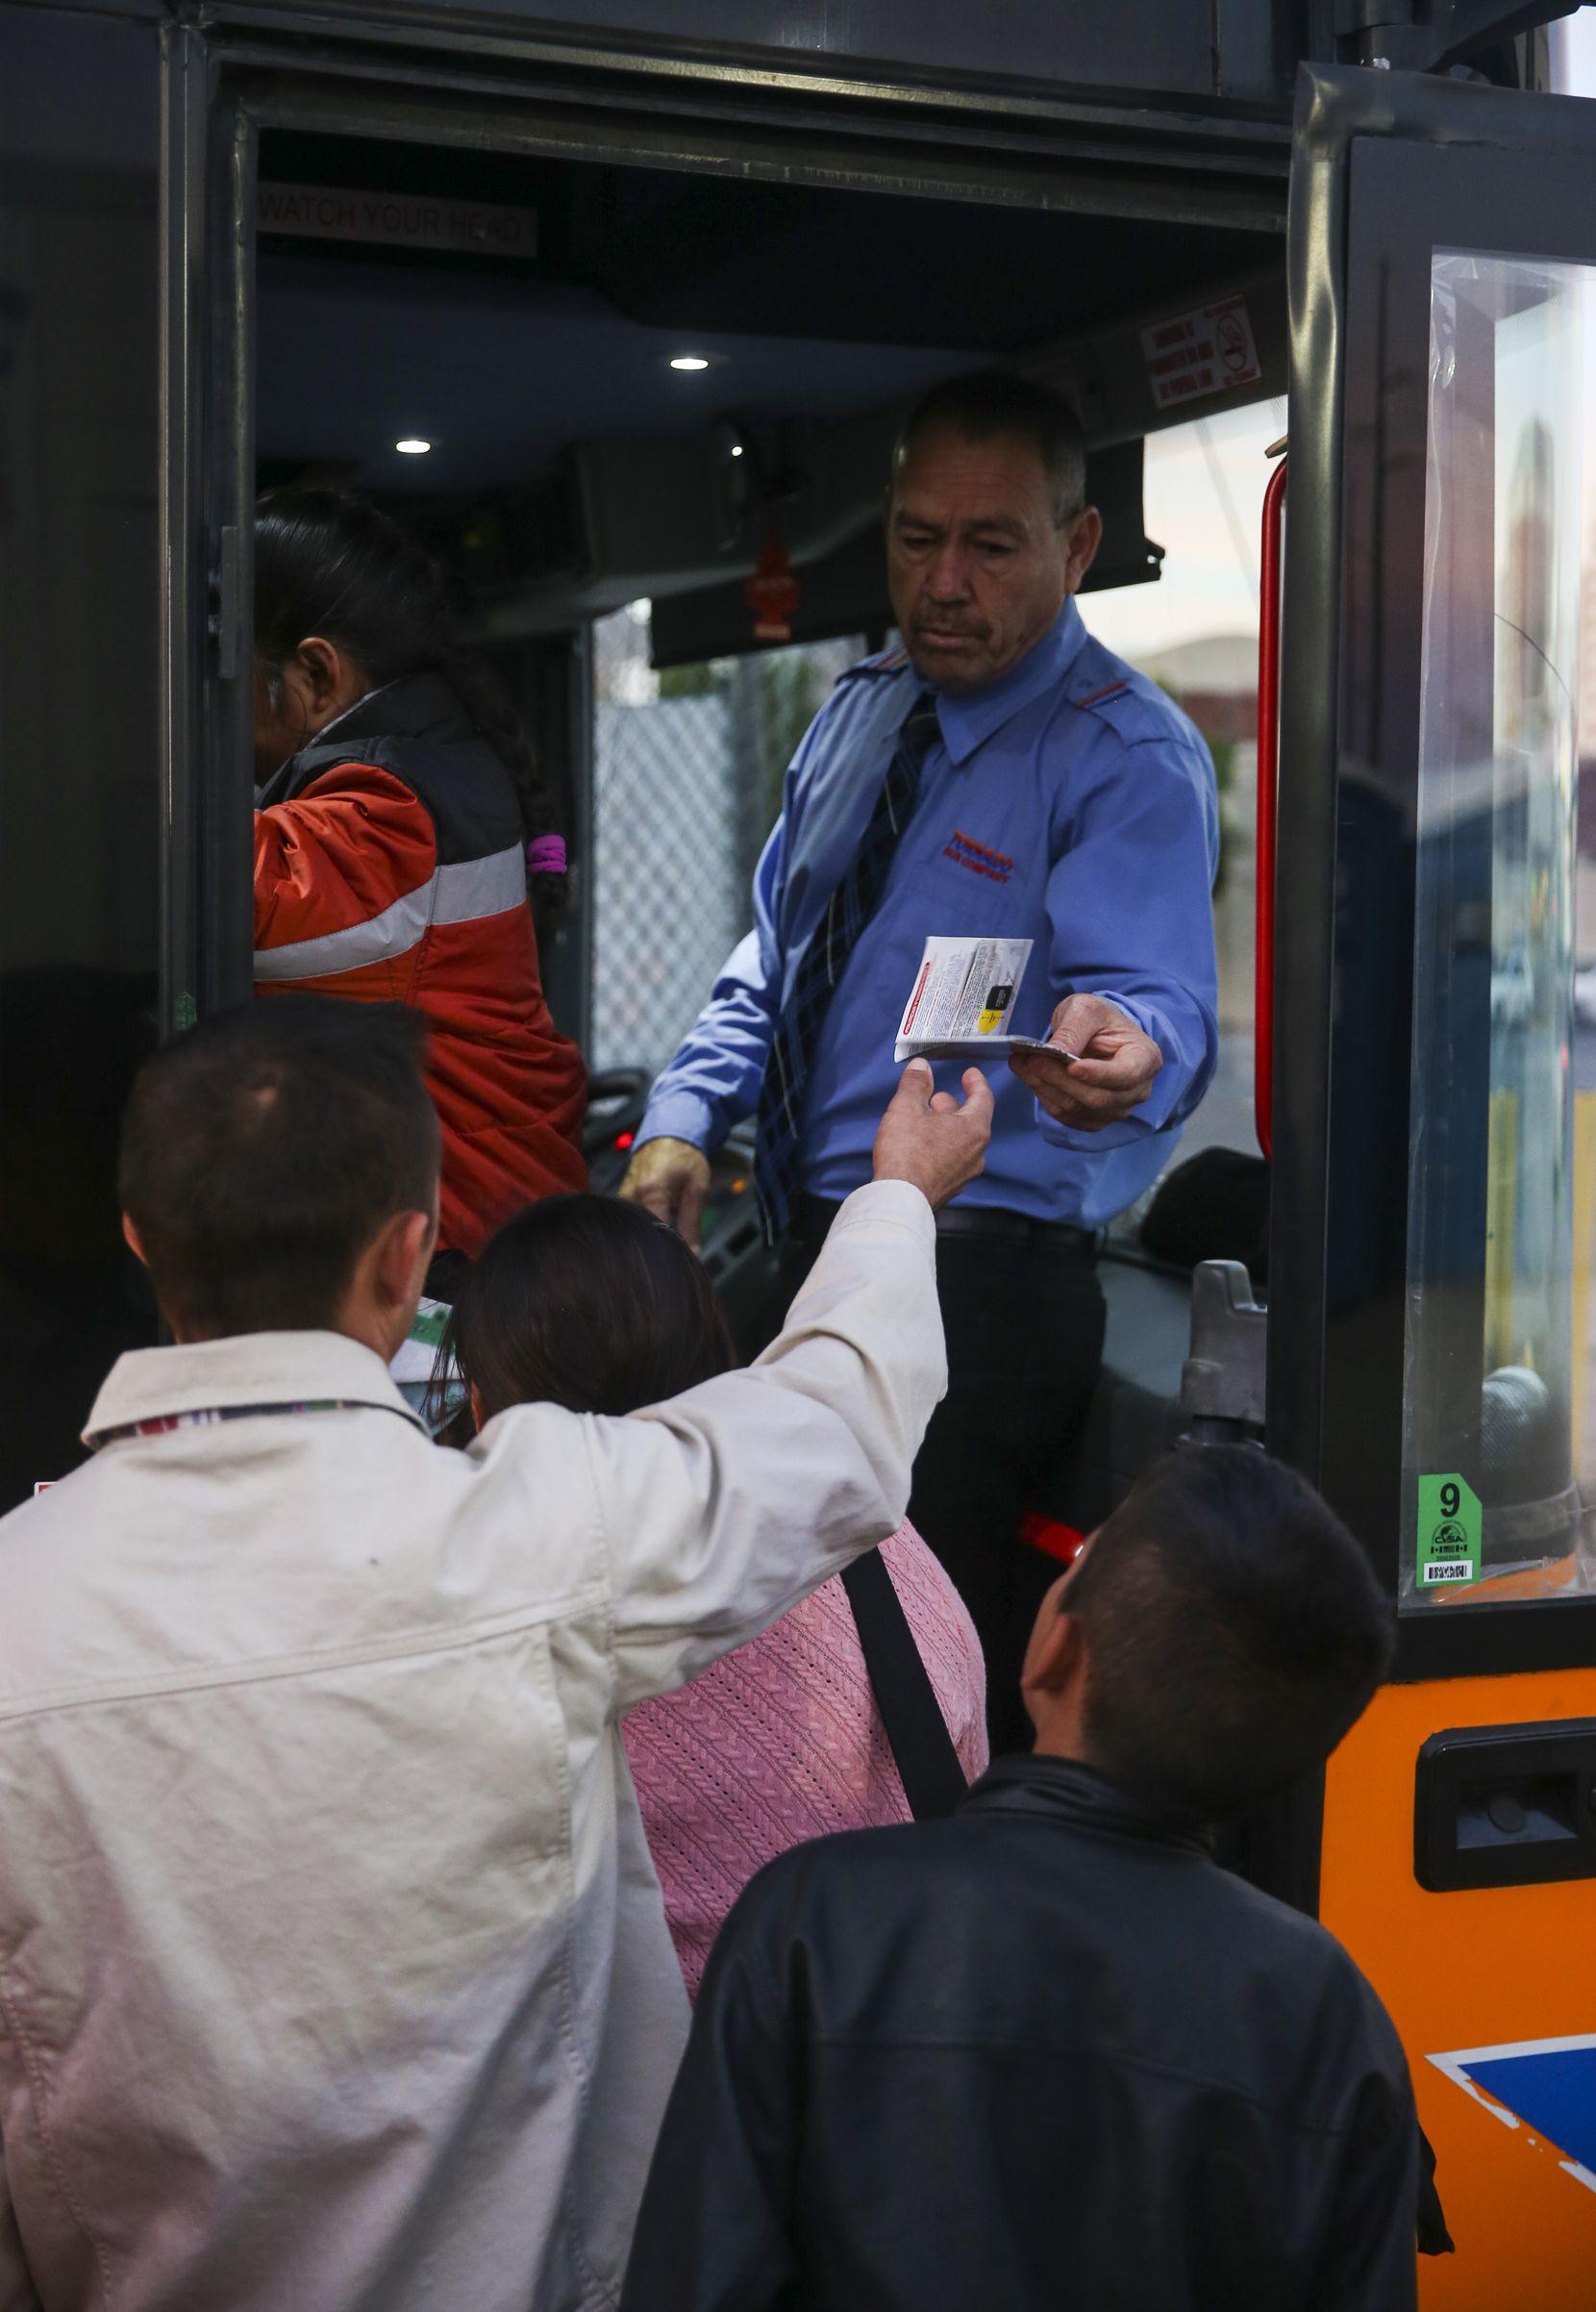 Migrant asylum seekers Carlos Joaquin Salinas, 29, of Santa Rosa, Guatamala, and his son Fernando Salinas, 10, board at the Tornado Bus station in El Paso, Texas, on Saturday, March 30, 2019 to travel to Arlington, Texas.